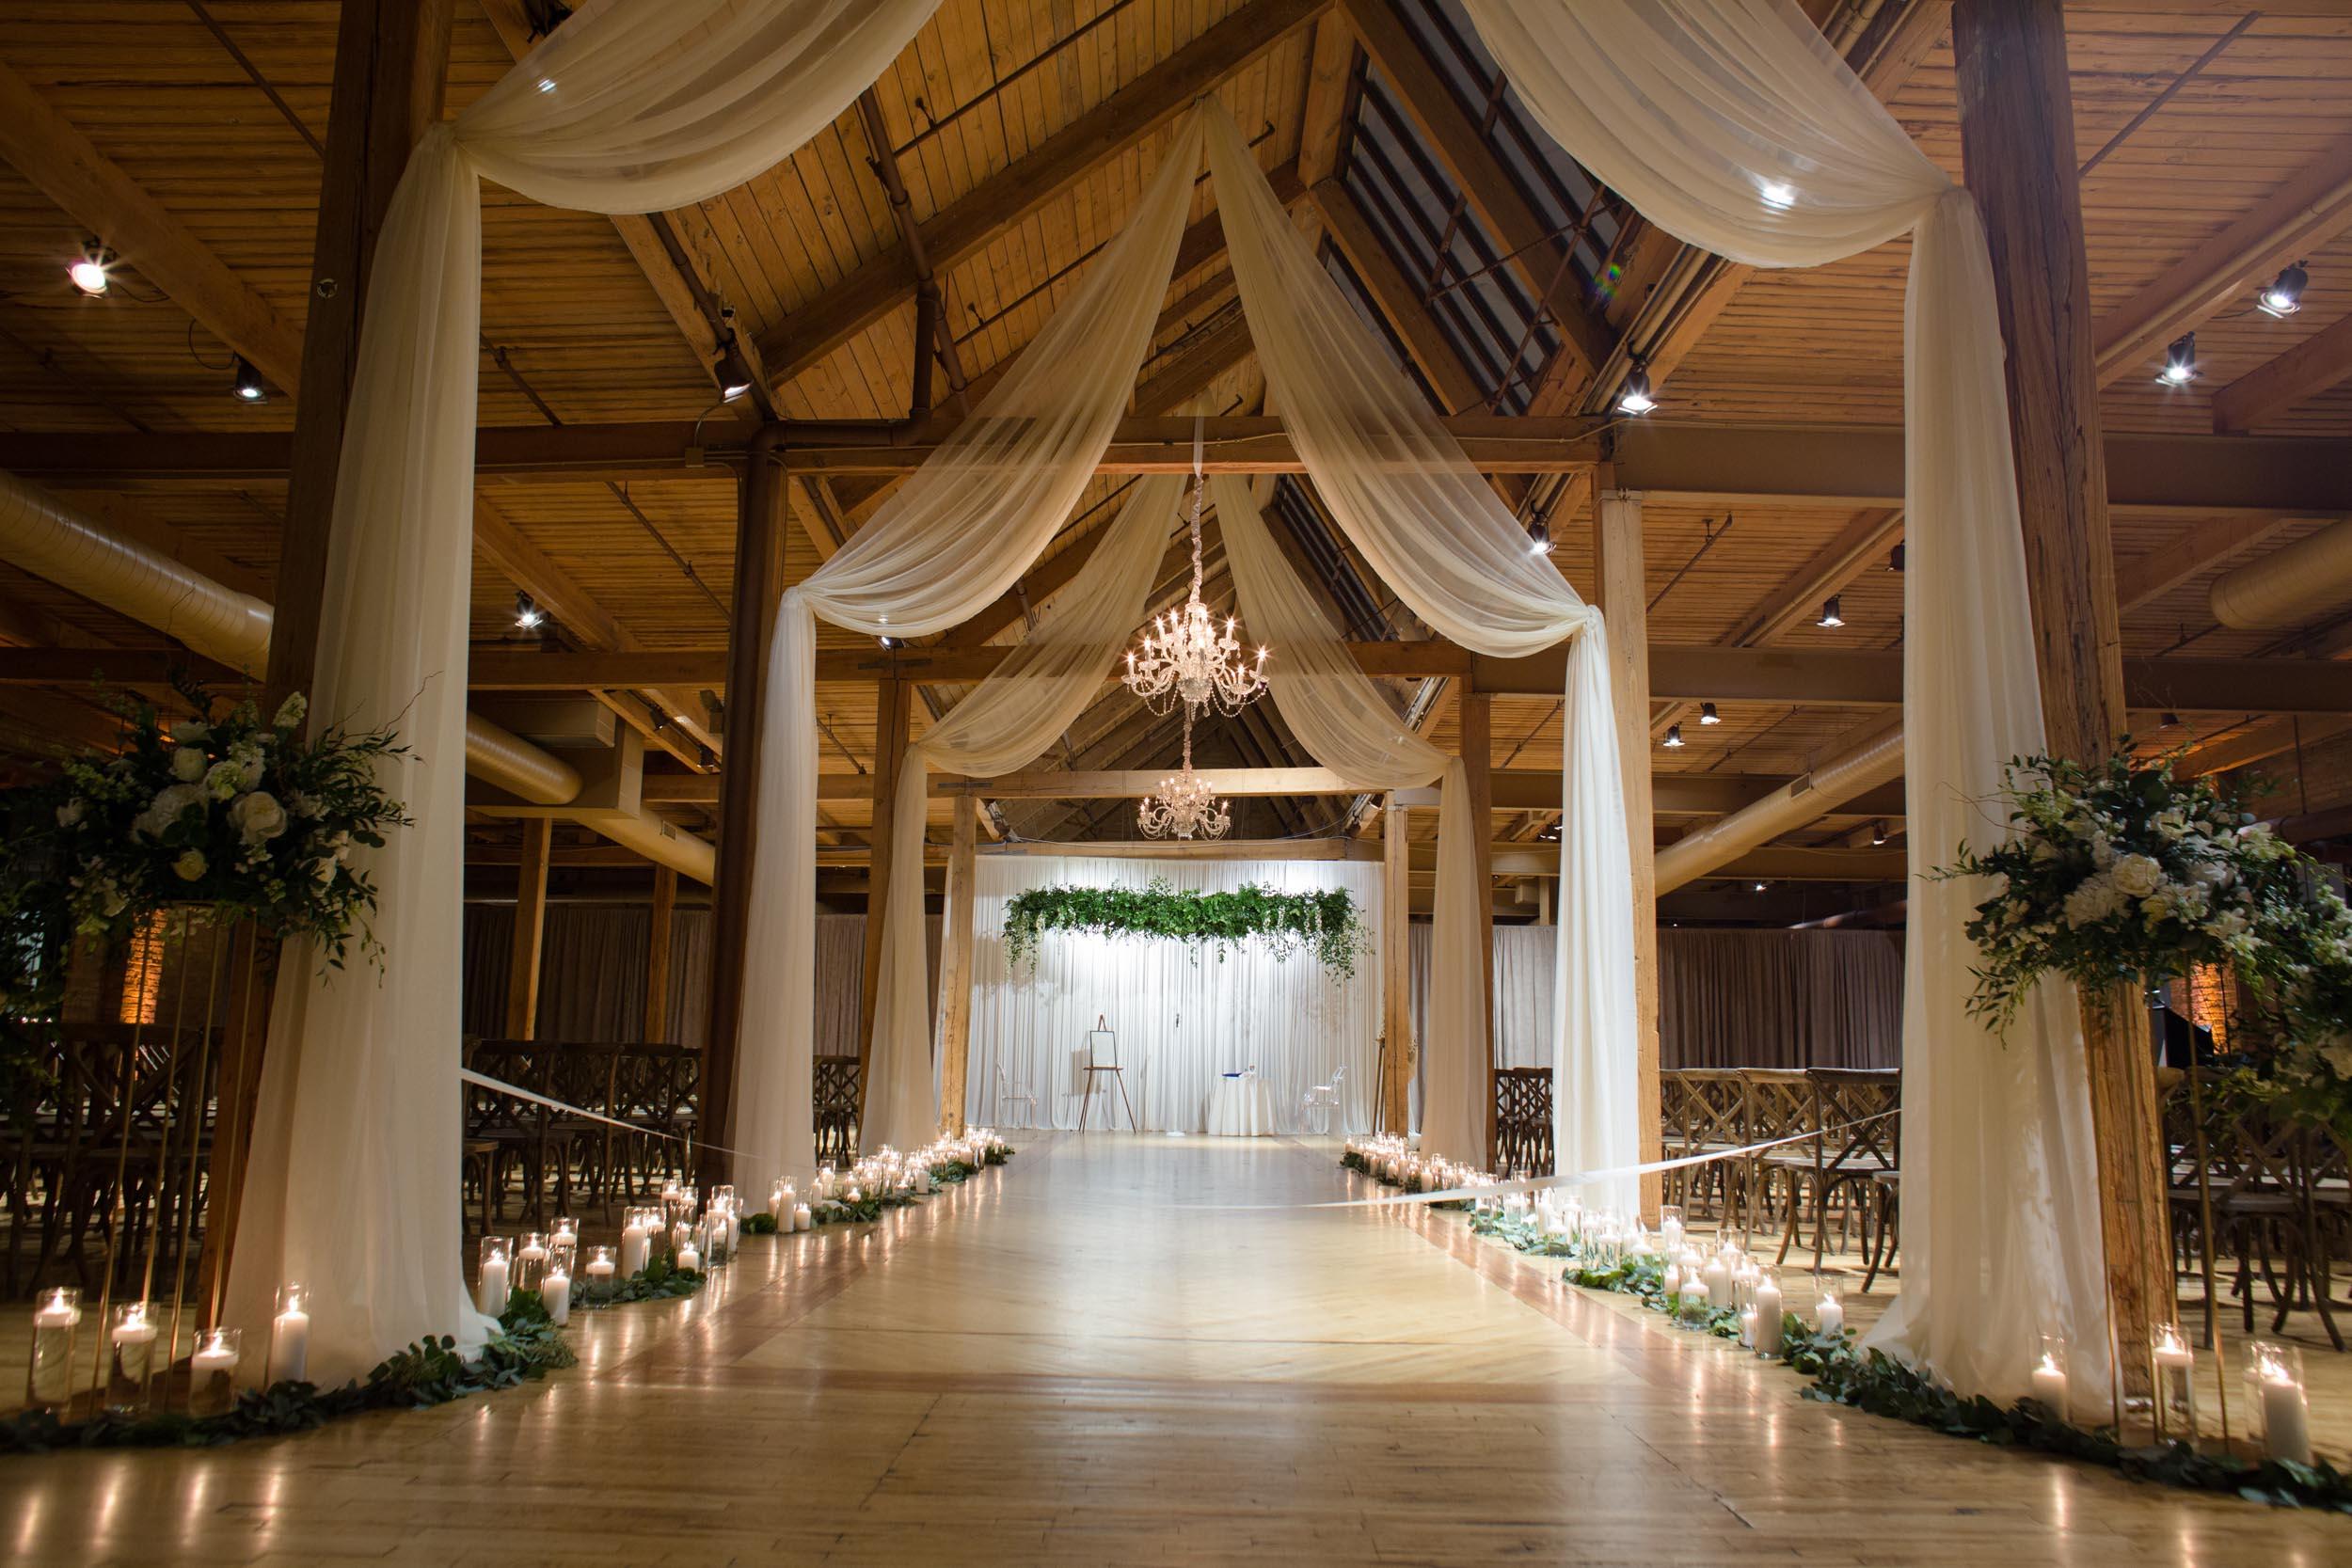 Winter wedding ceremony decor at Bridgeport Art Center